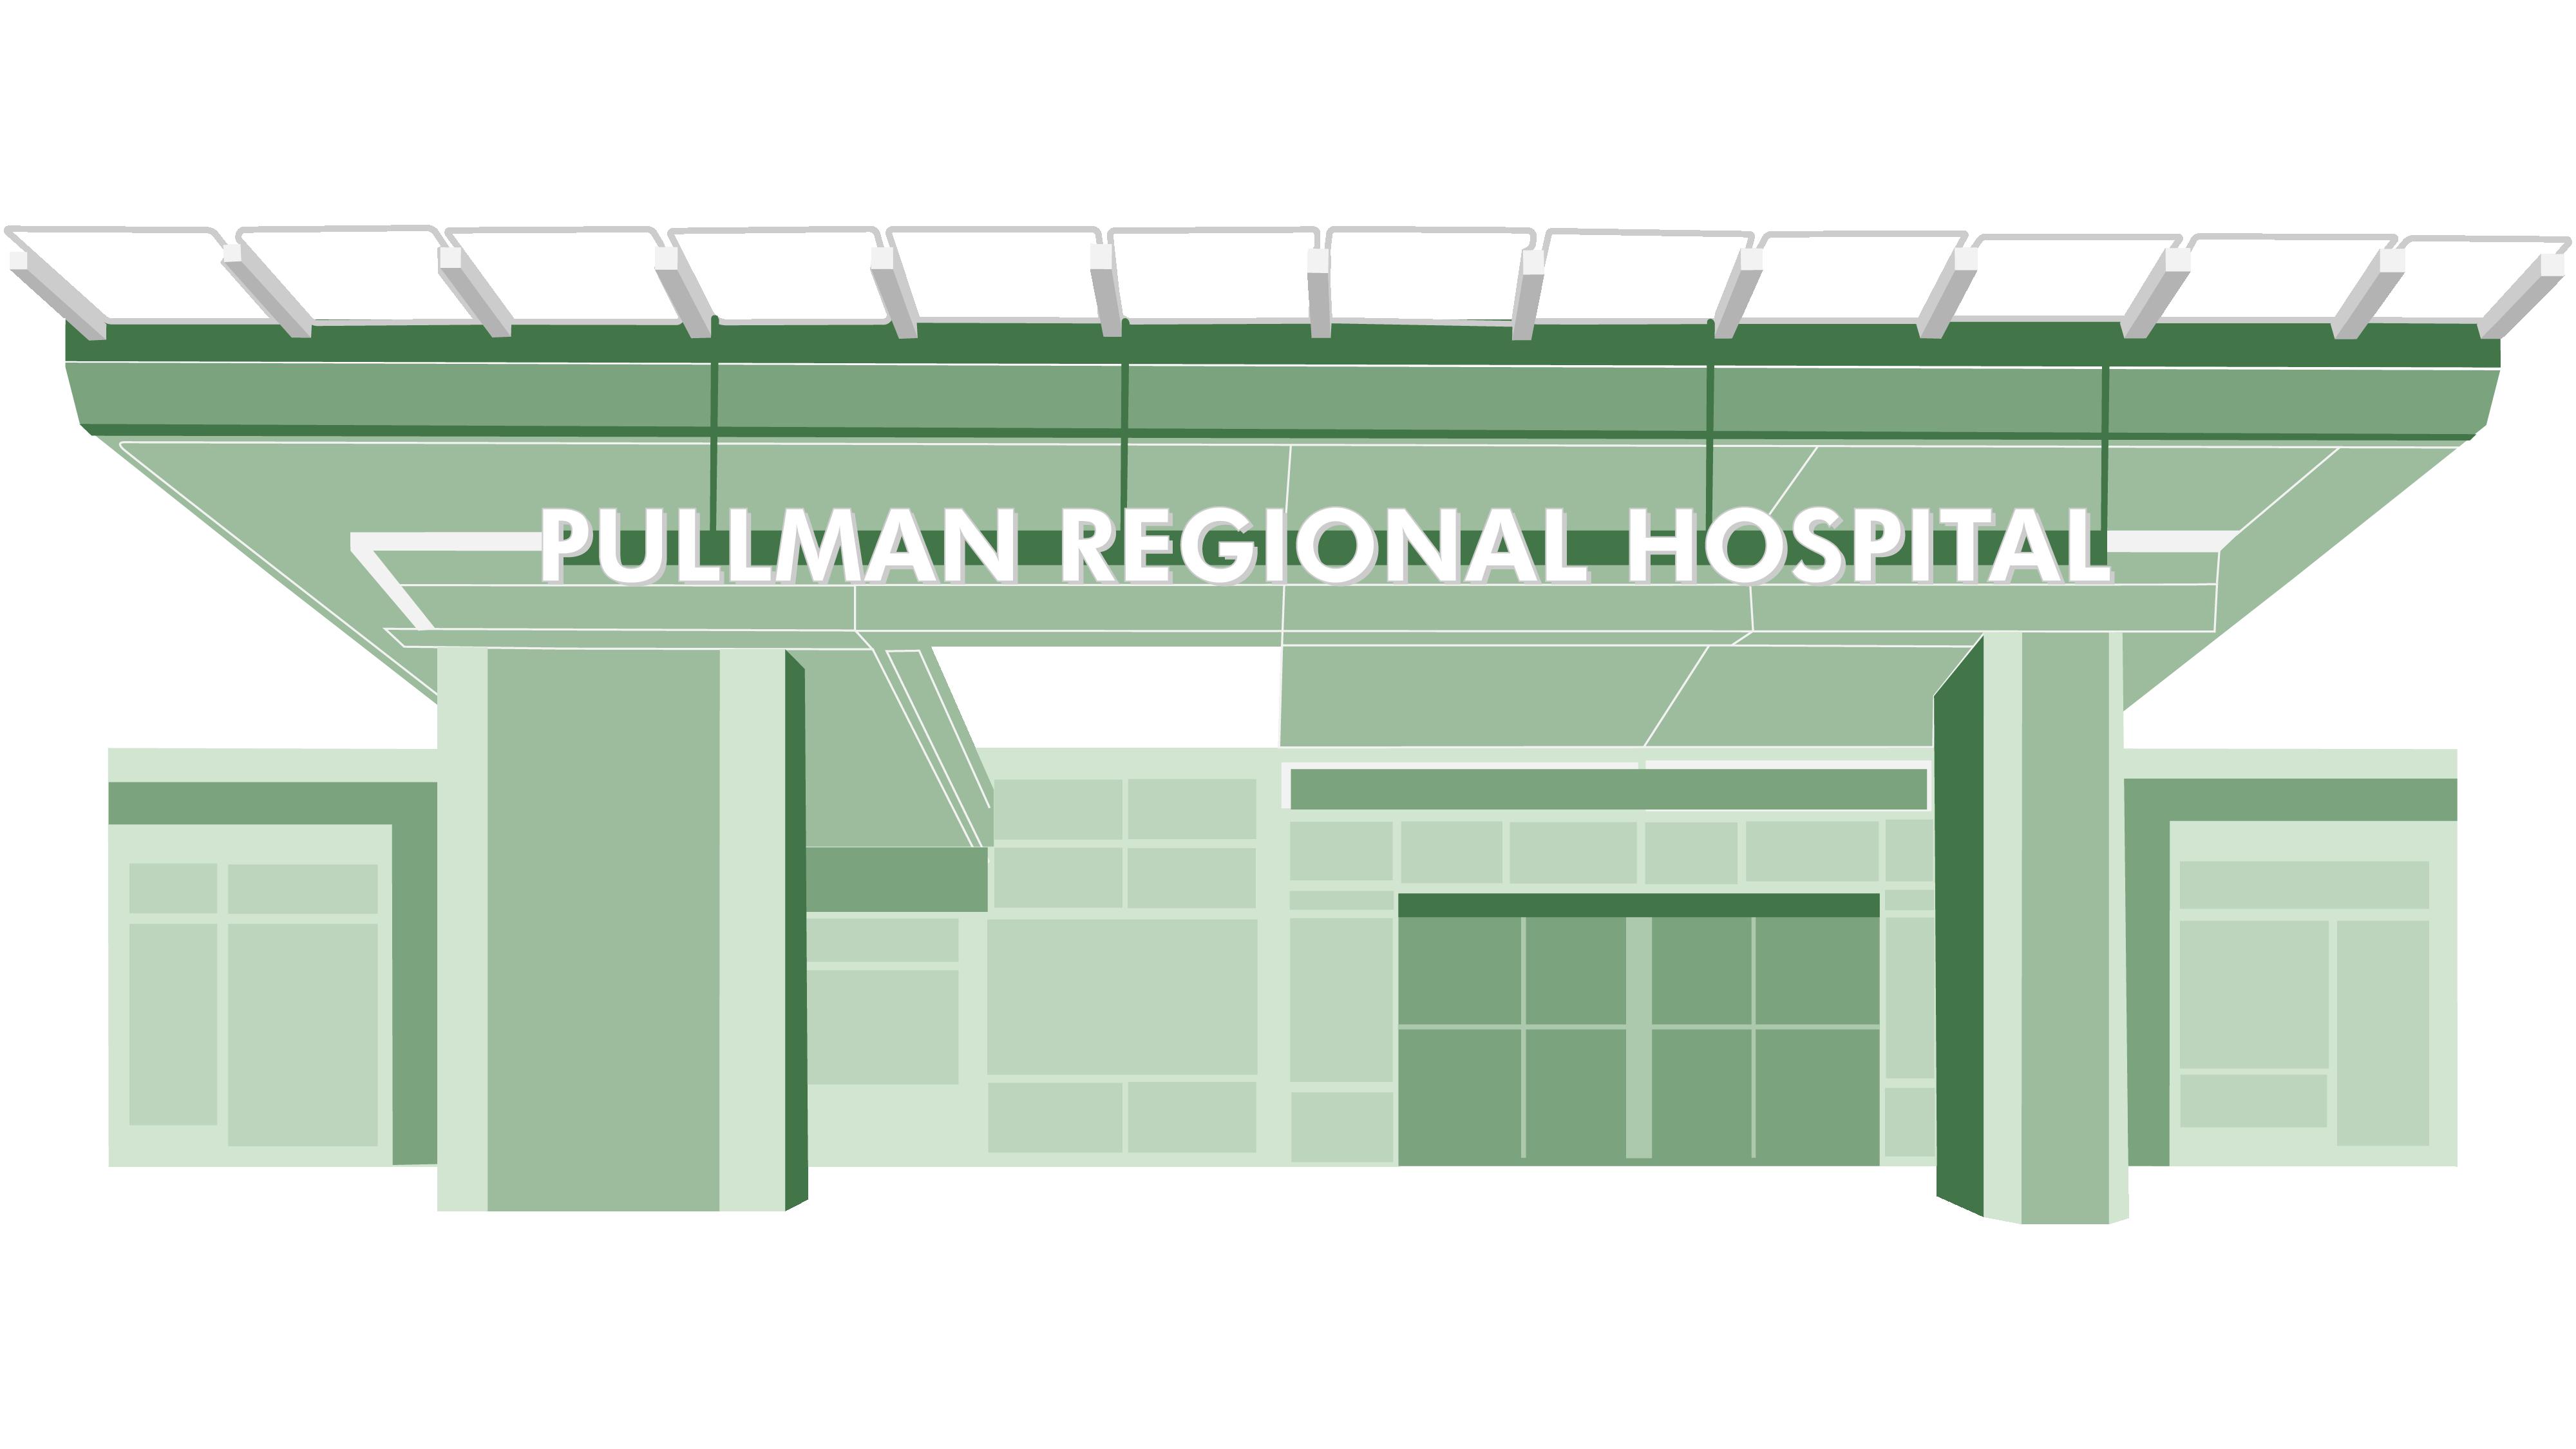 Pullman Regional Hospital Hospital Week 2021